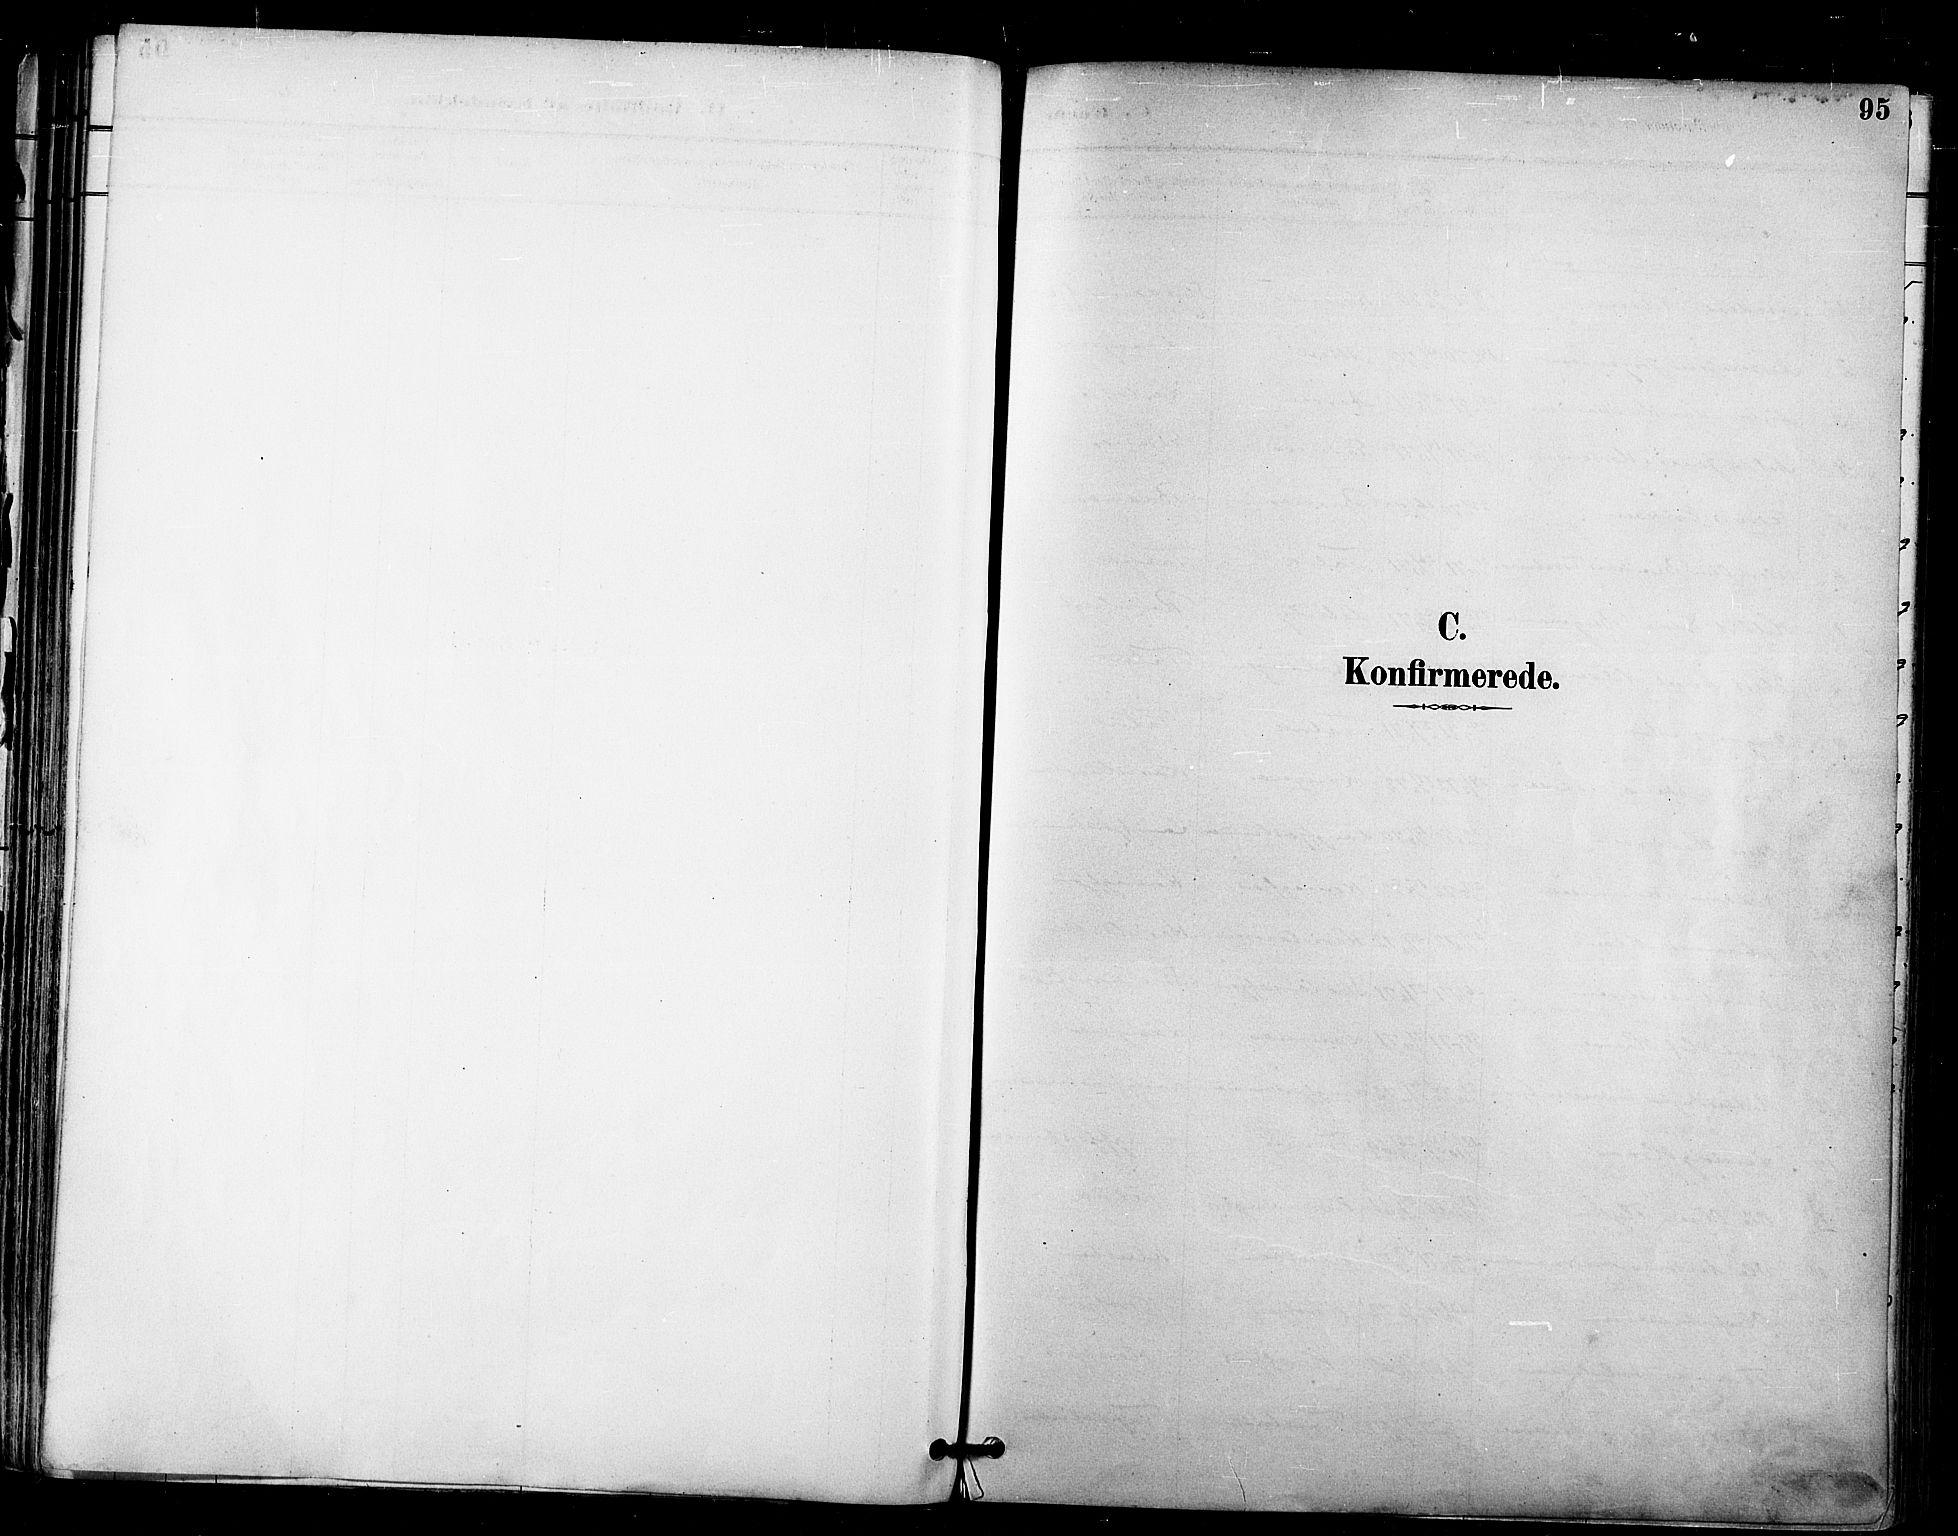 SATØ, Talvik sokneprestkontor, H/Ha/L0013kirke: Ministerialbok nr. 13, 1886-1897, s. 95